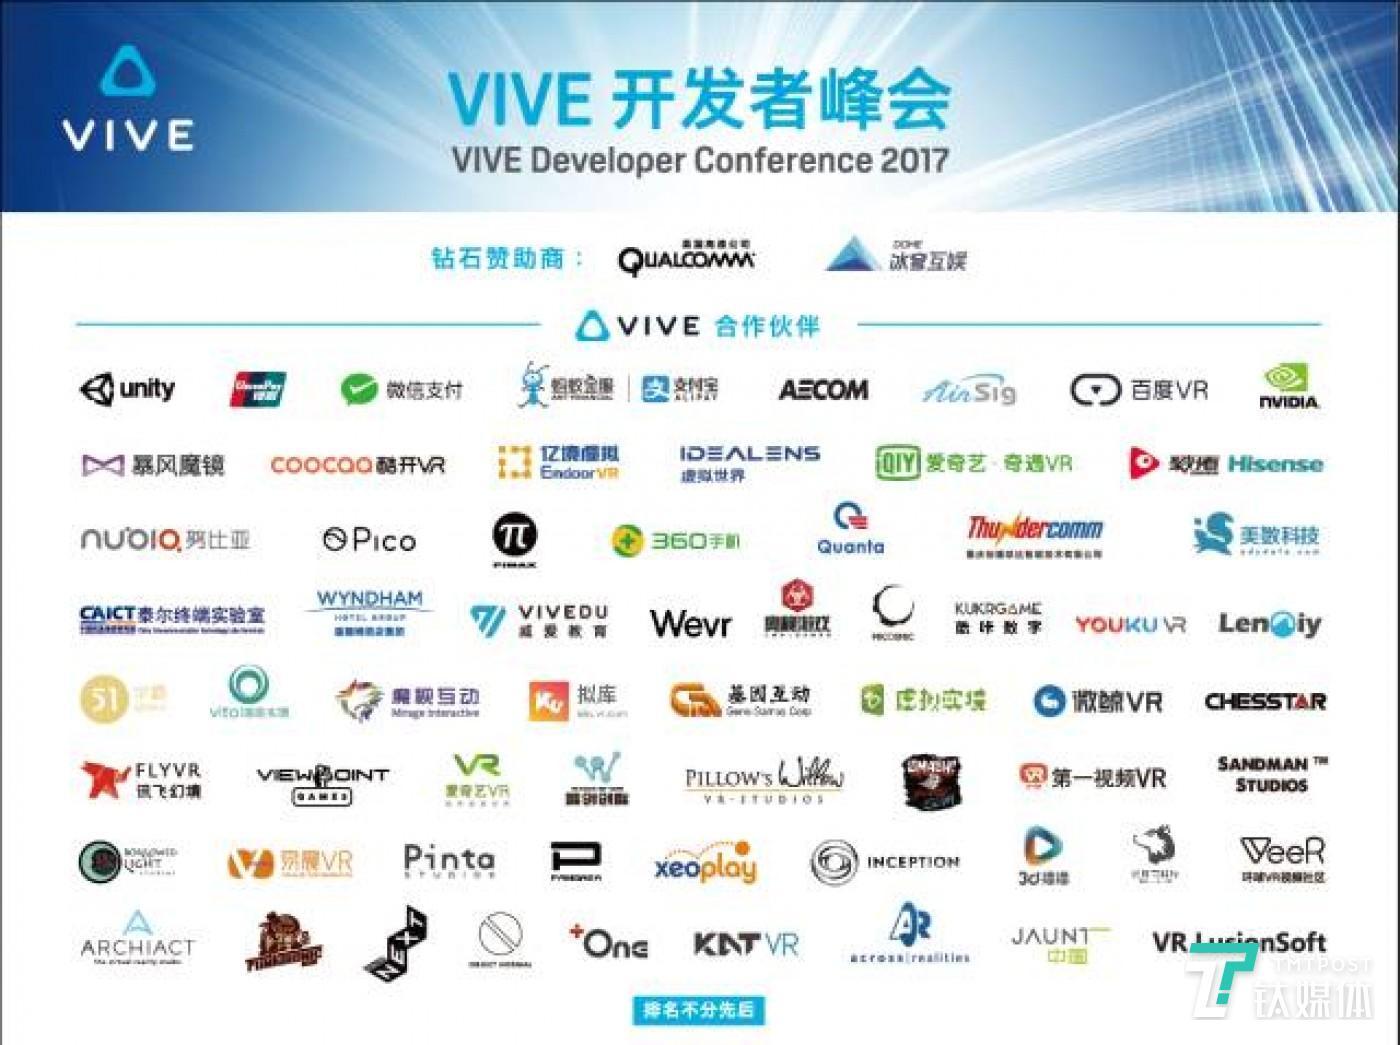 Vive Wave 合作伙伴